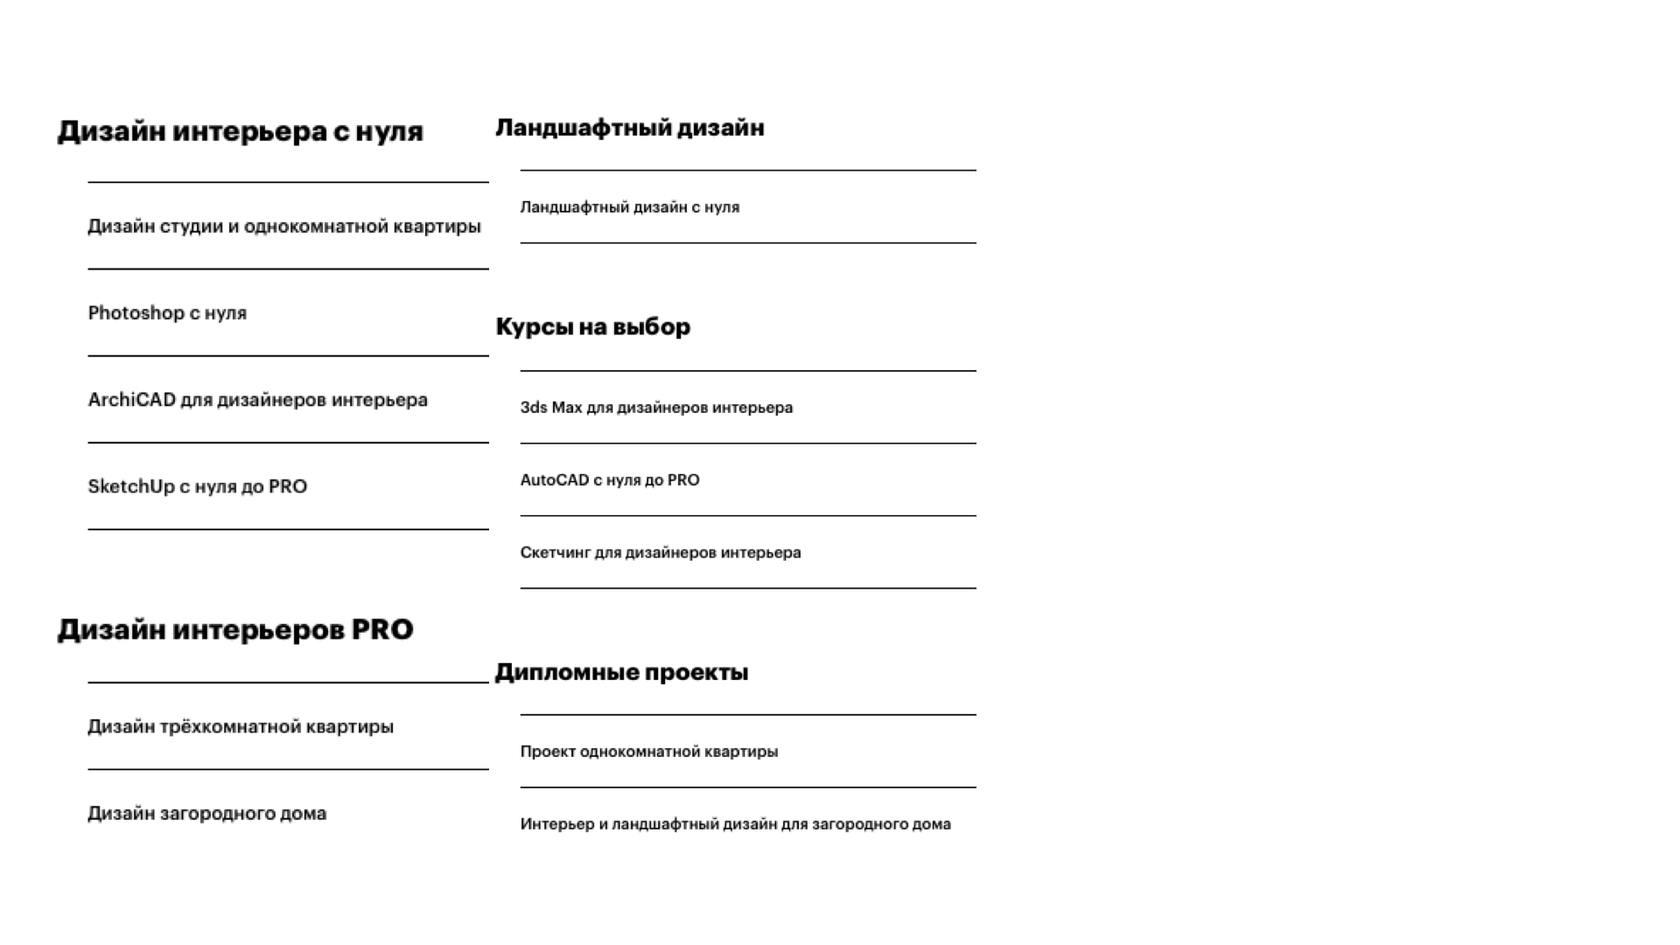 Программа курса «Дизайнер интерьеров и ландшафта» от Skillbox